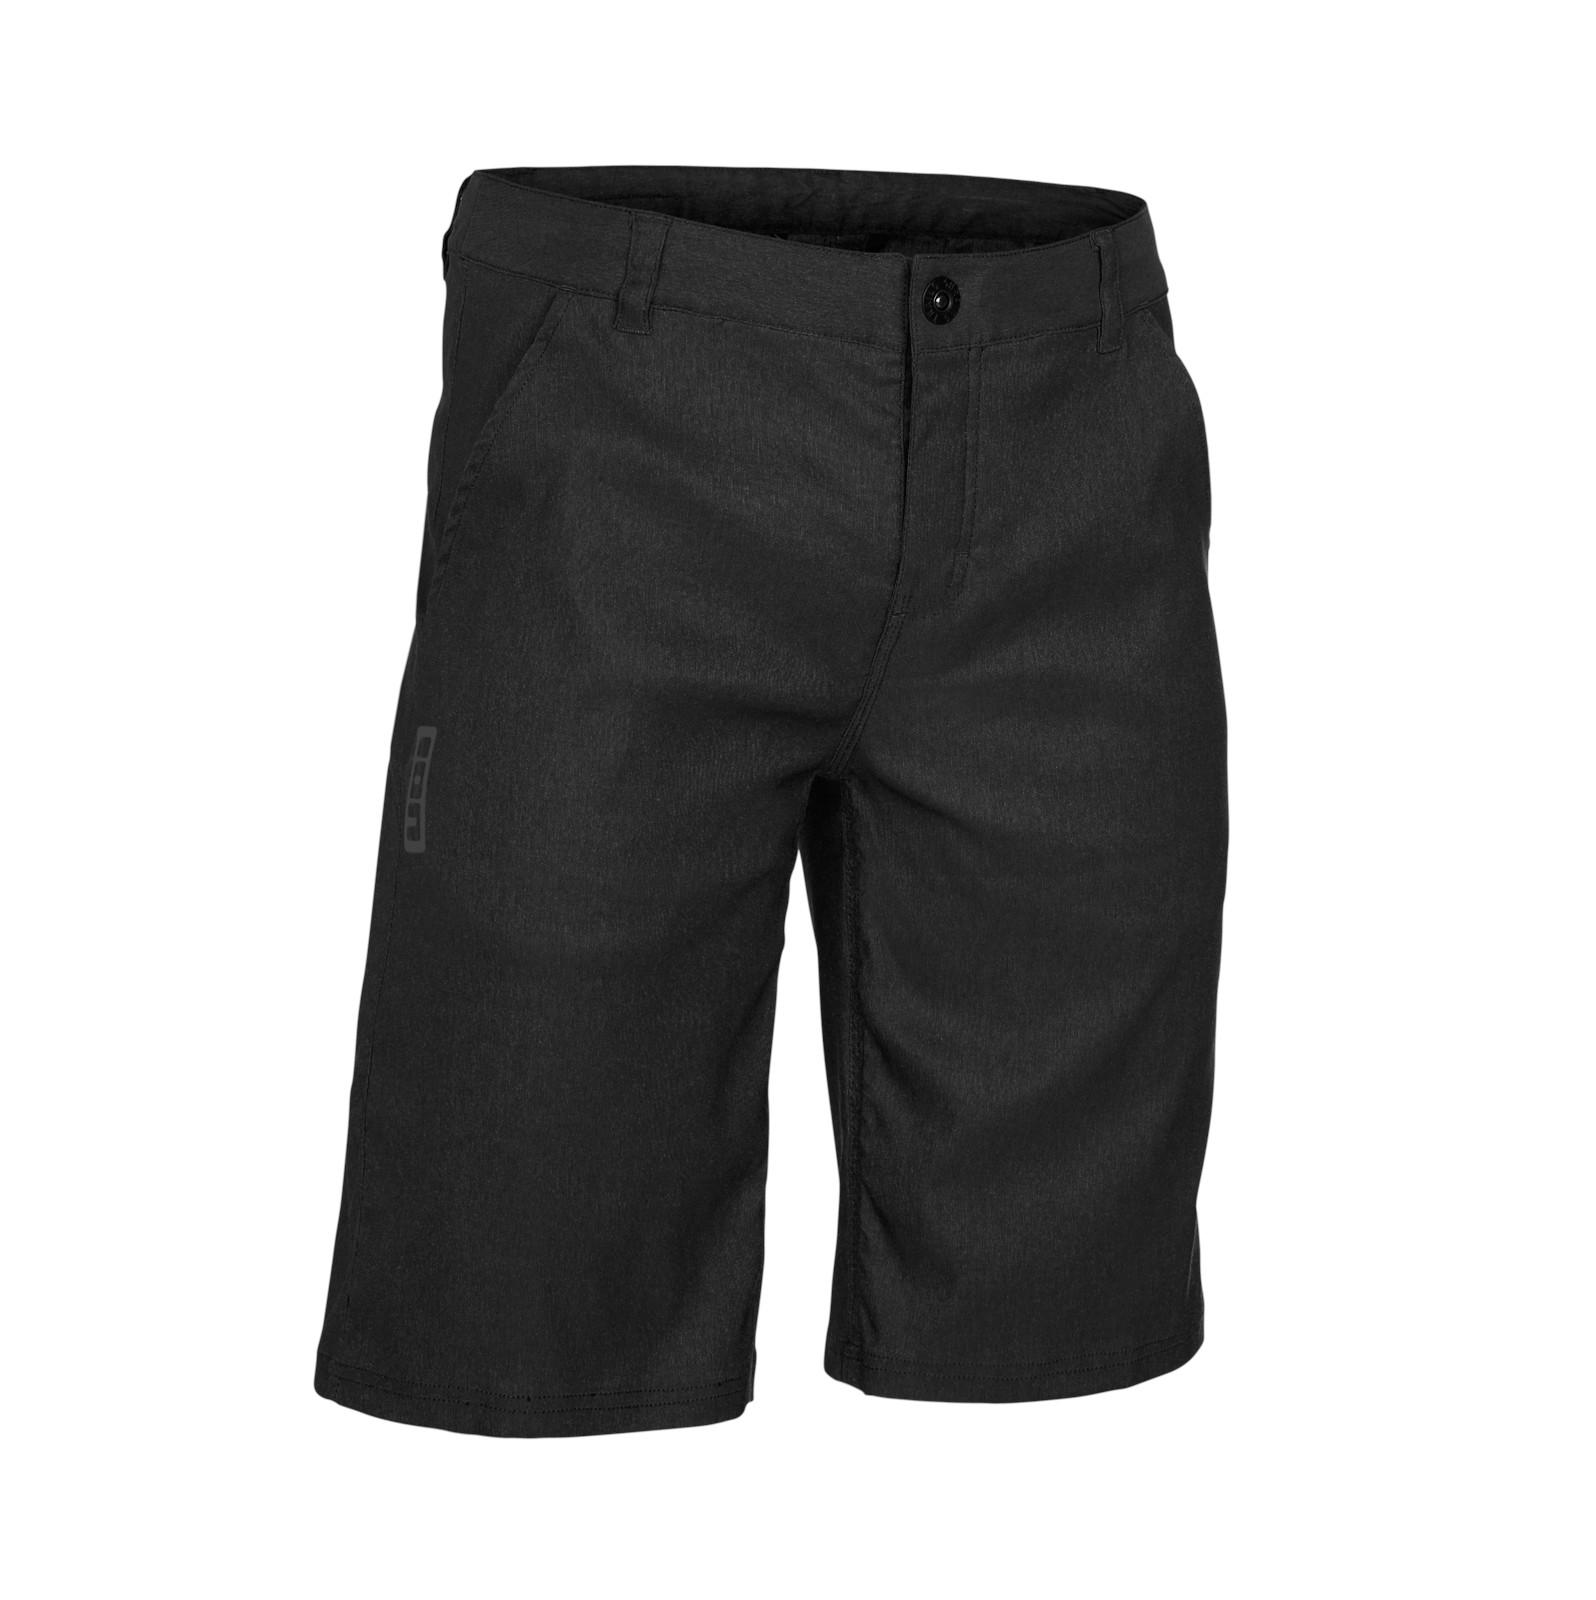 ION Seek Bike Short (black)